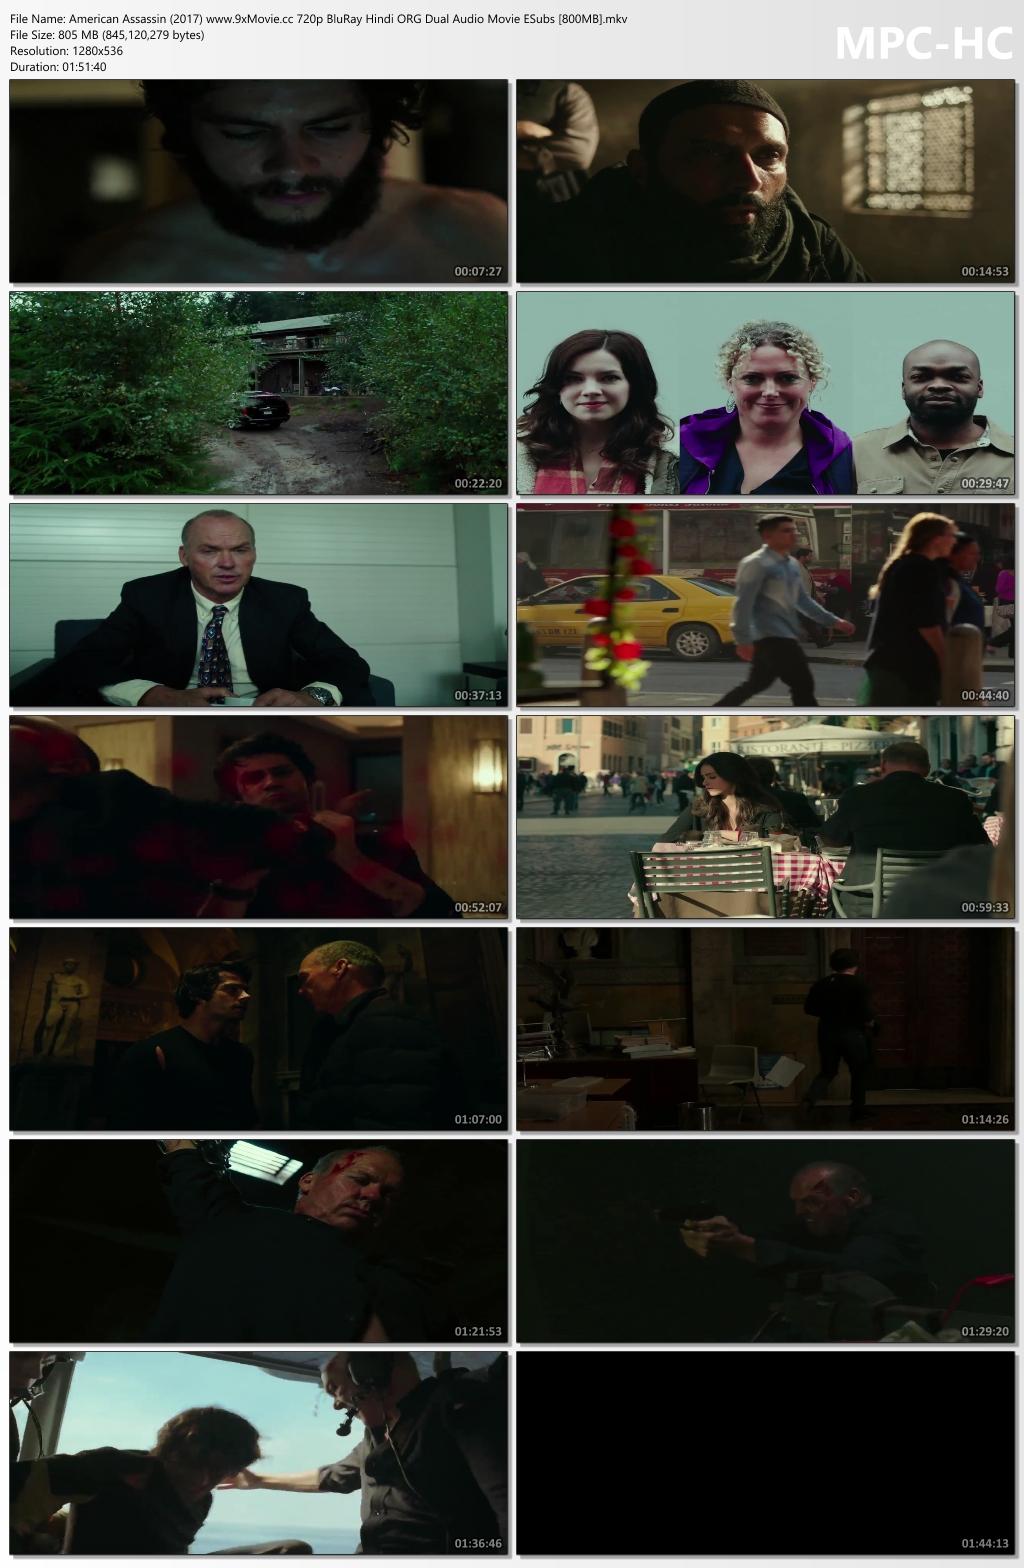 American-Assassin-2017-www-9x-Movie-cc-720p-Blu-Ray-Hindi-ORG-Dual-Audio-Movie-ESubs-800-MB-mkv